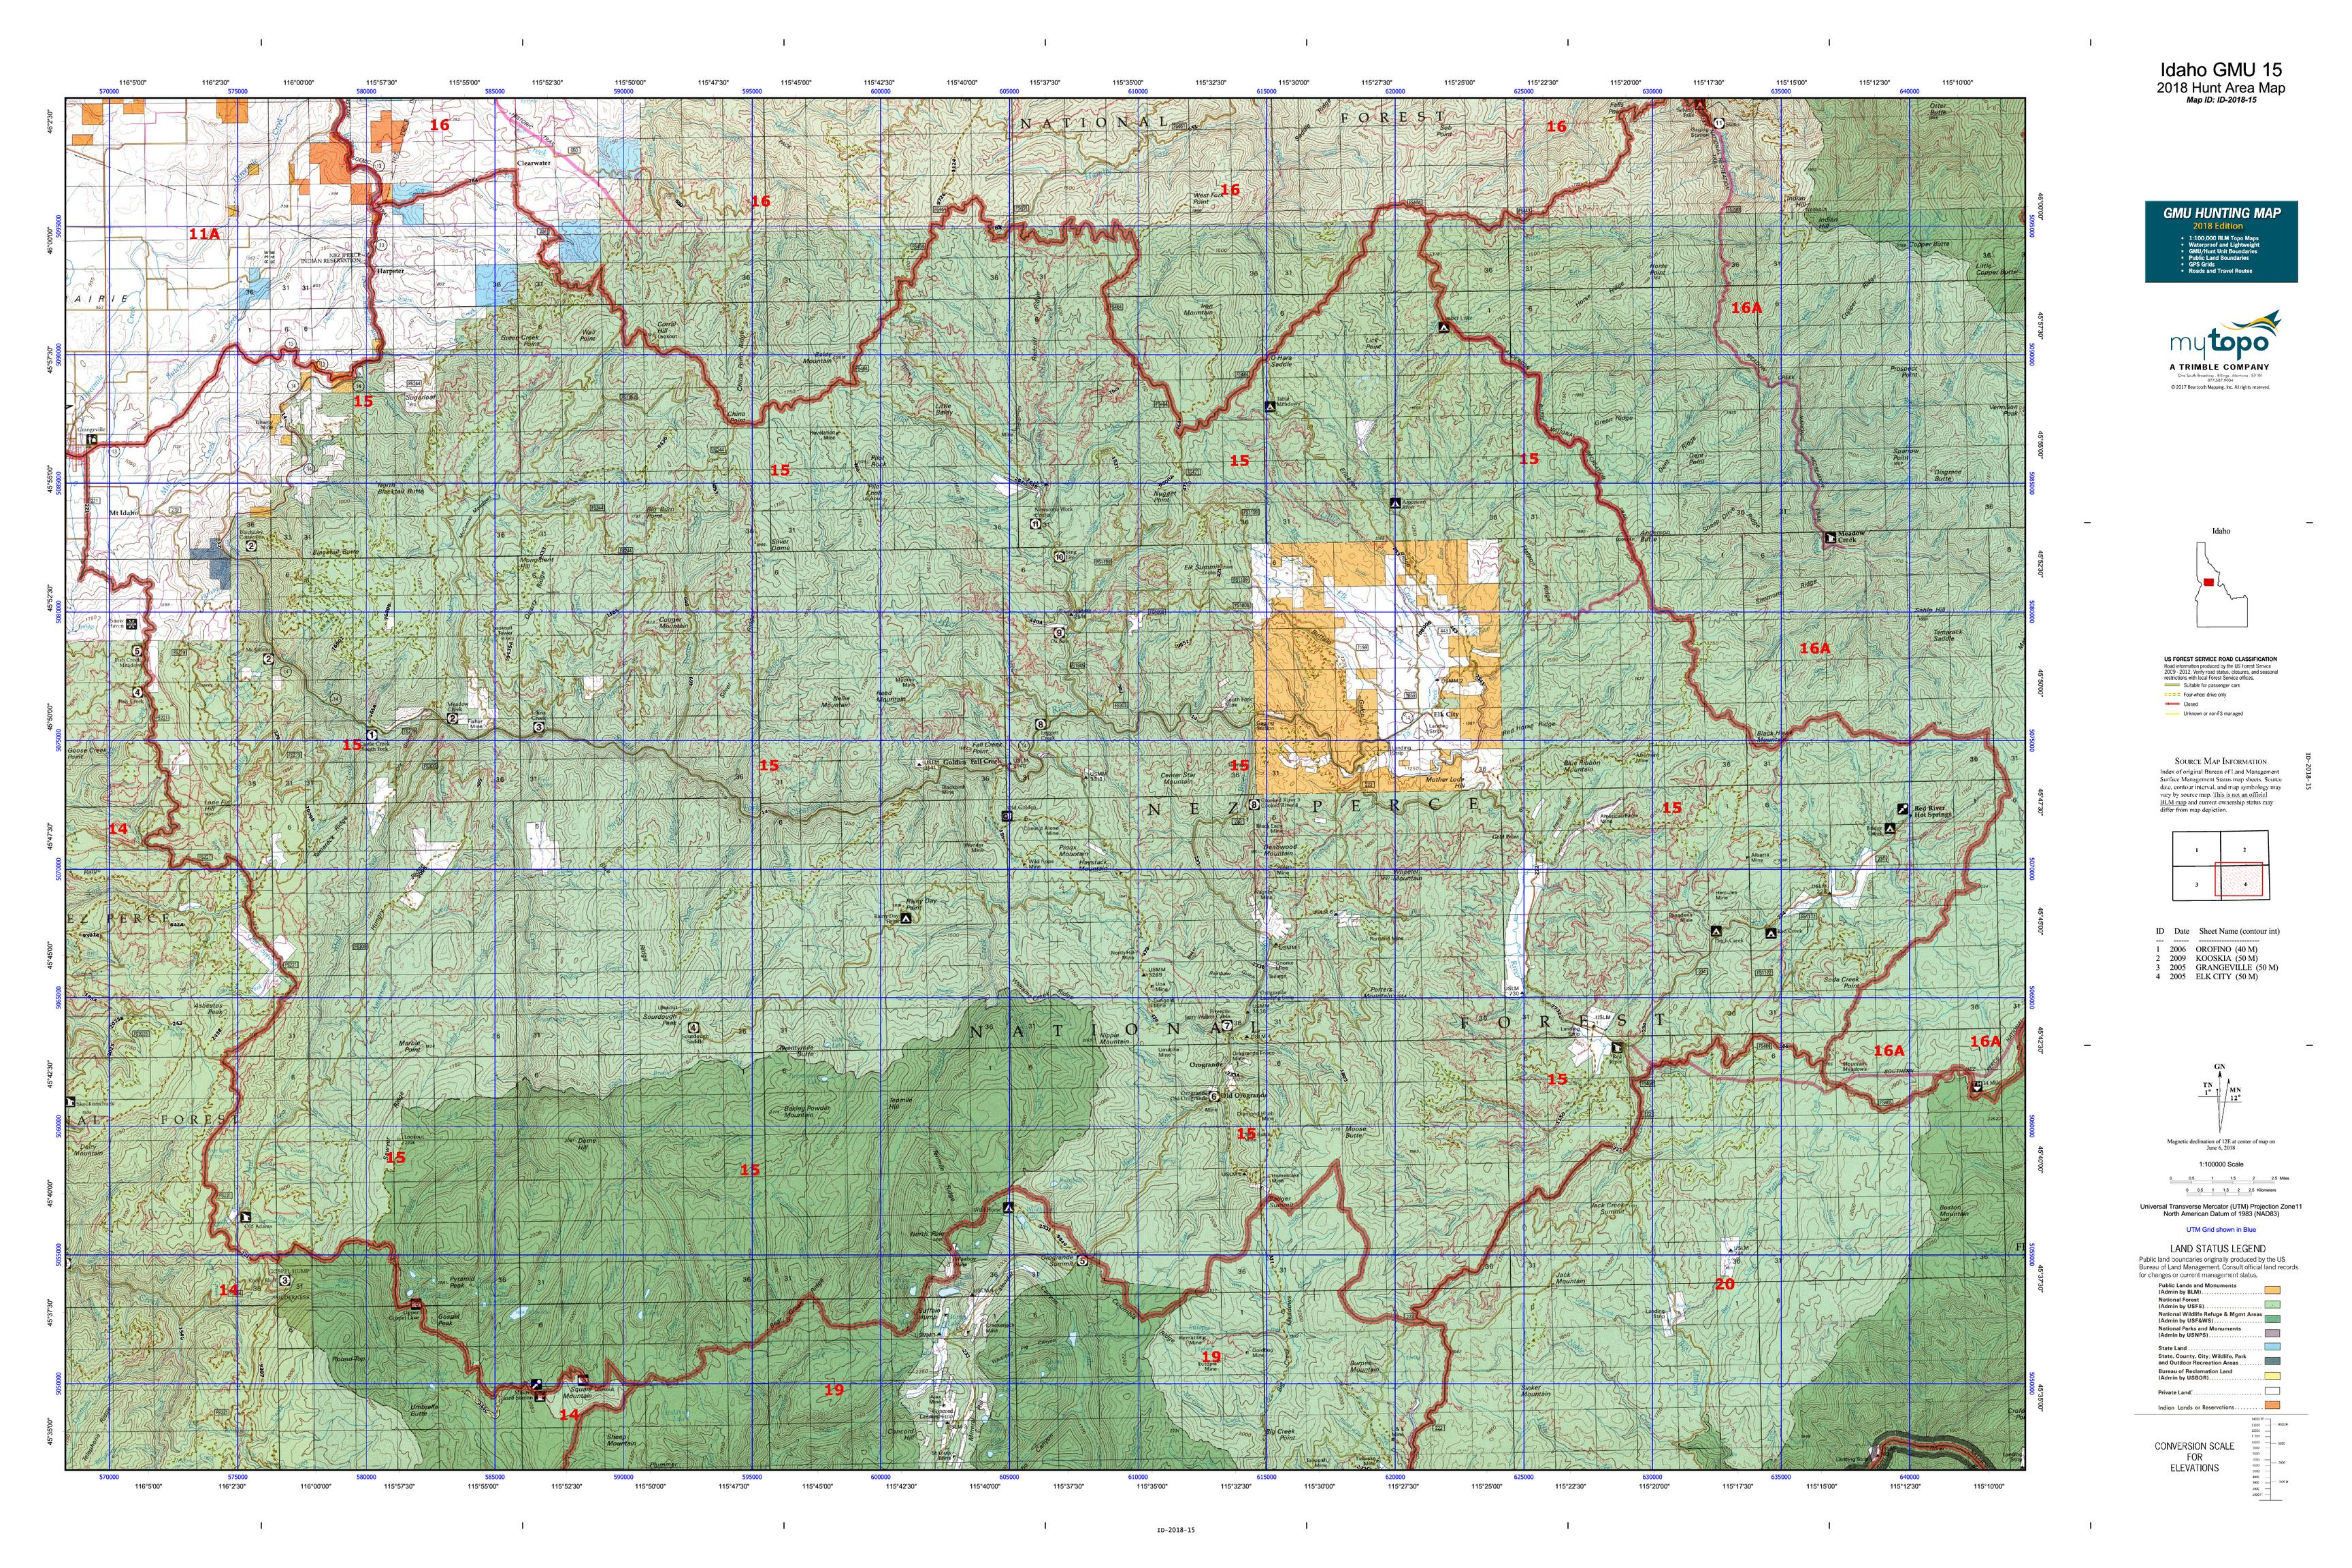 Idaho GMU 15 Map | MyTopo